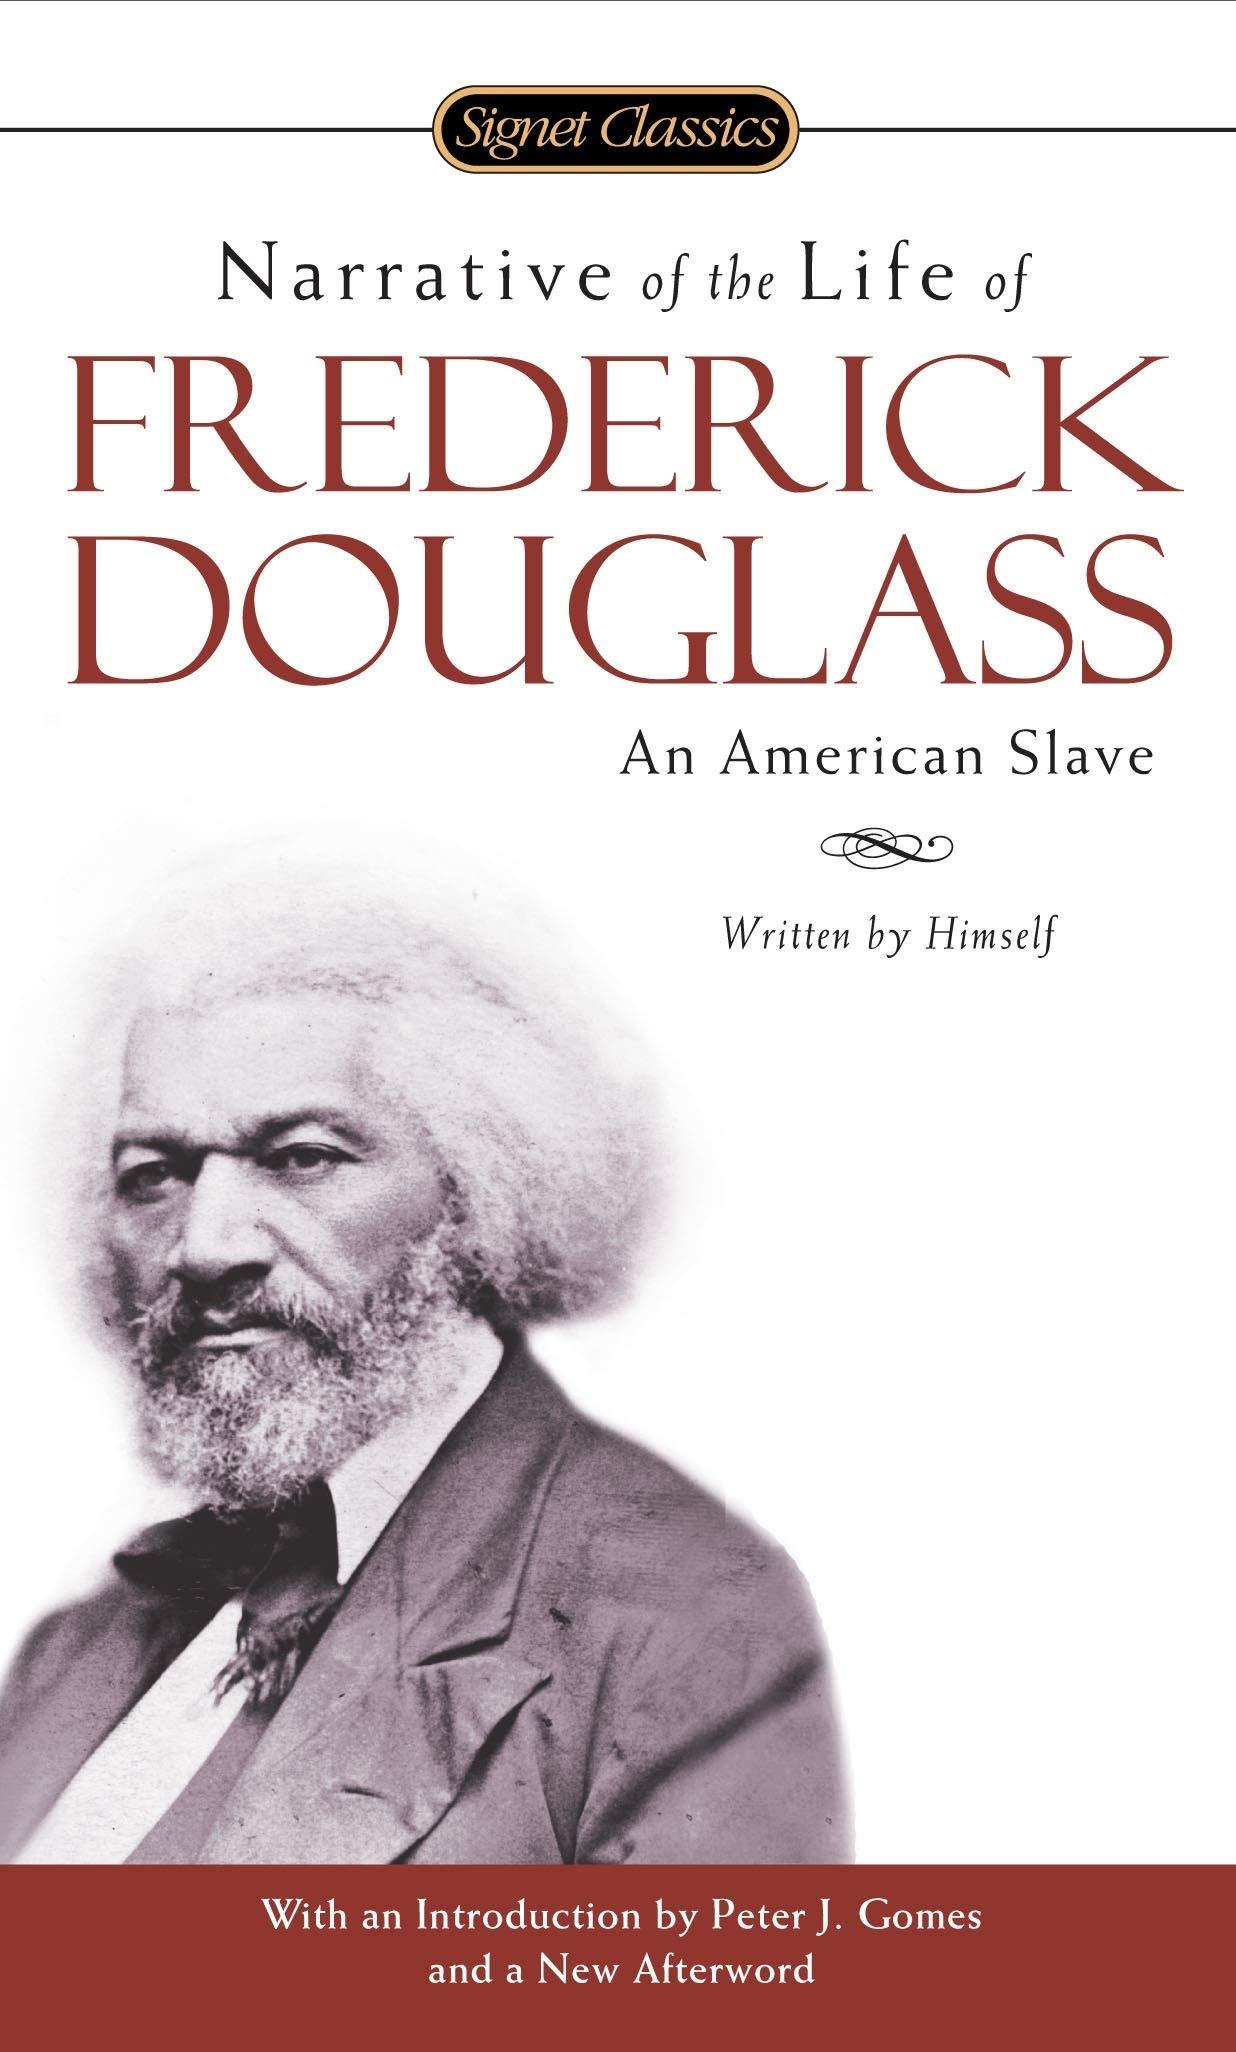 Narrative of the Life of Frederick Douglass (Signet Classics)